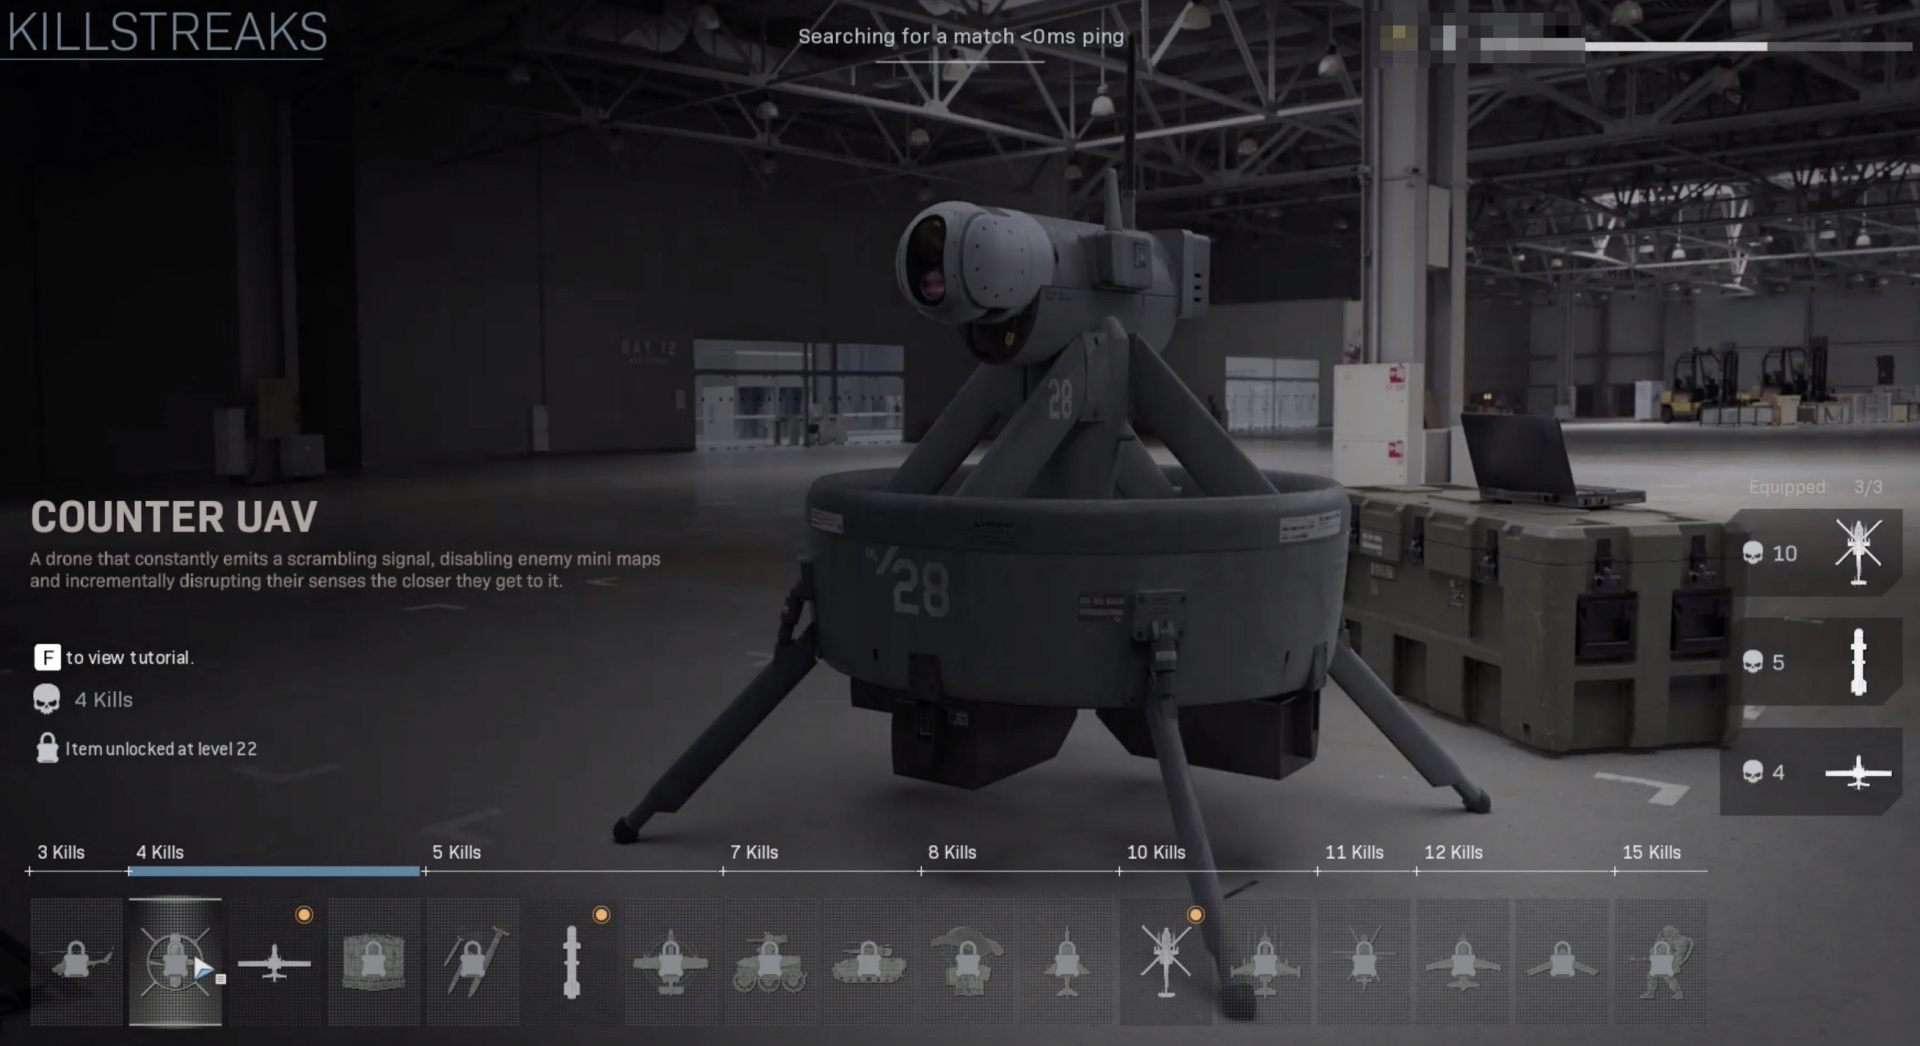 Warzone Counter Uav Killstreak Guide Call Of Duty Modern Warfare Gamewith